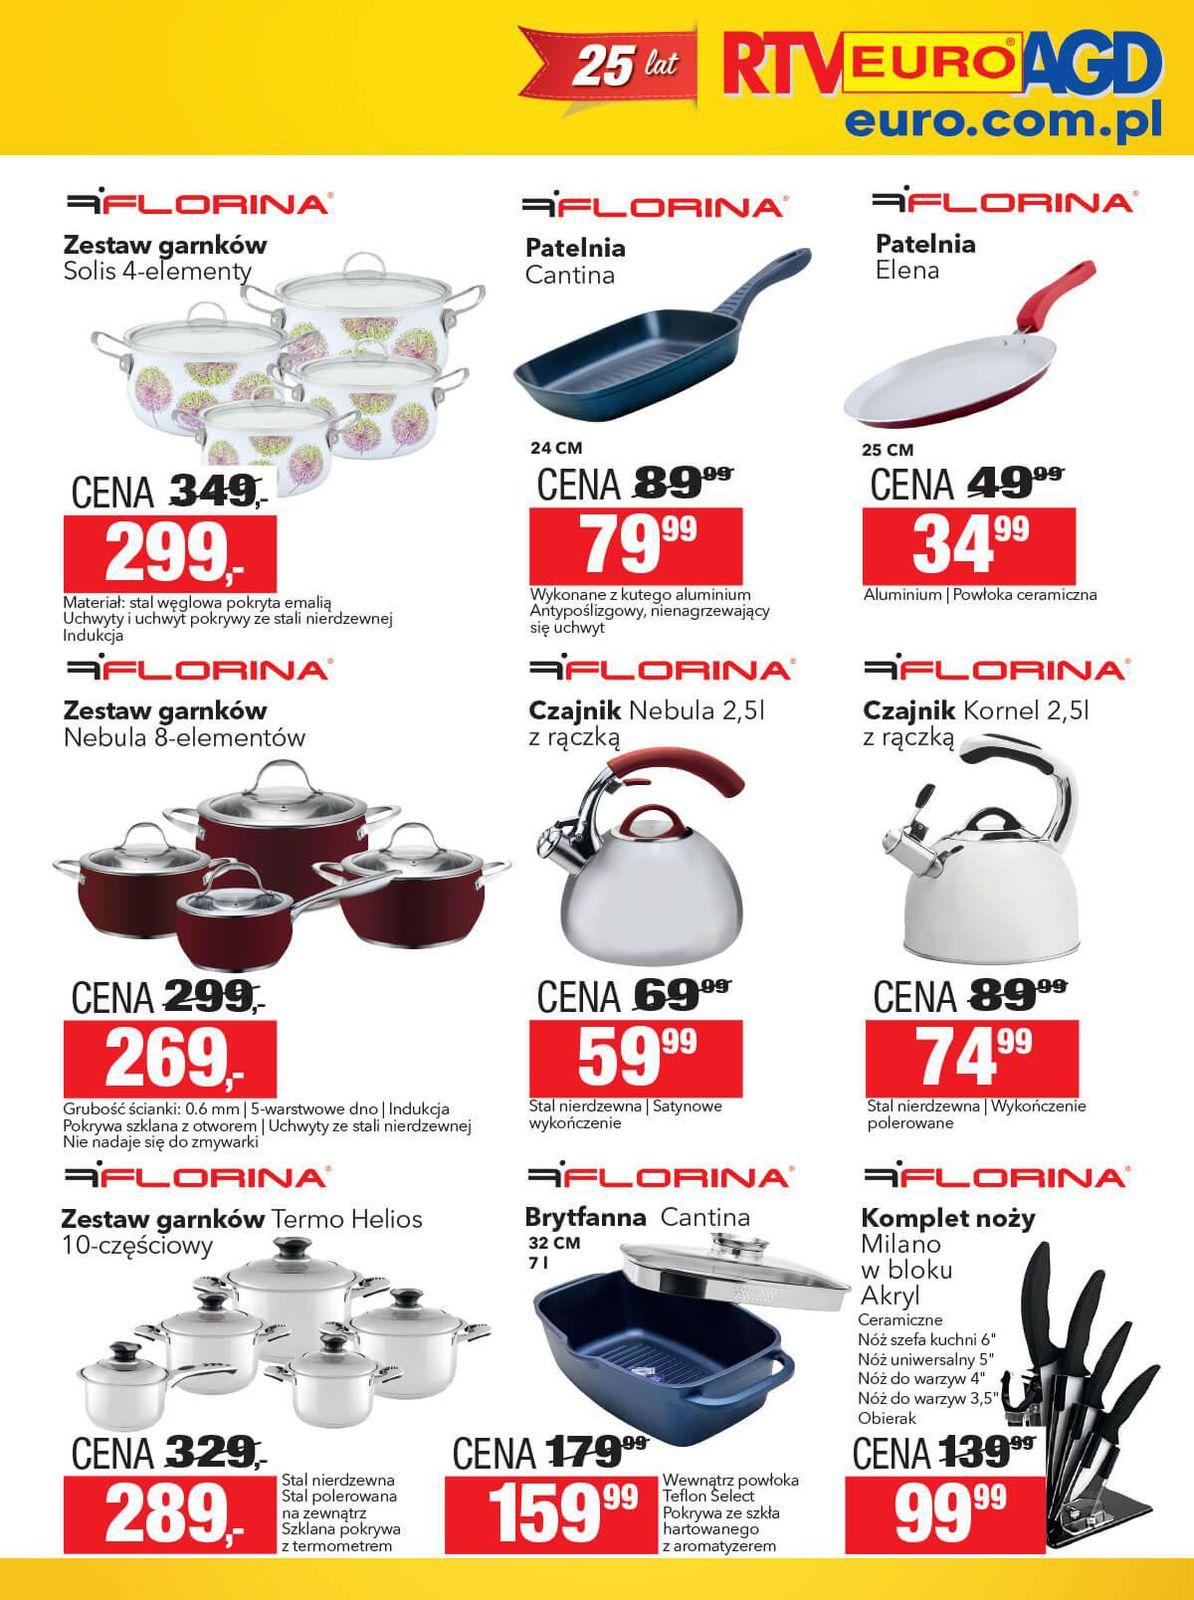 Gazetka promocyjna RTV Euro AGD do 31/12/2015 str.20